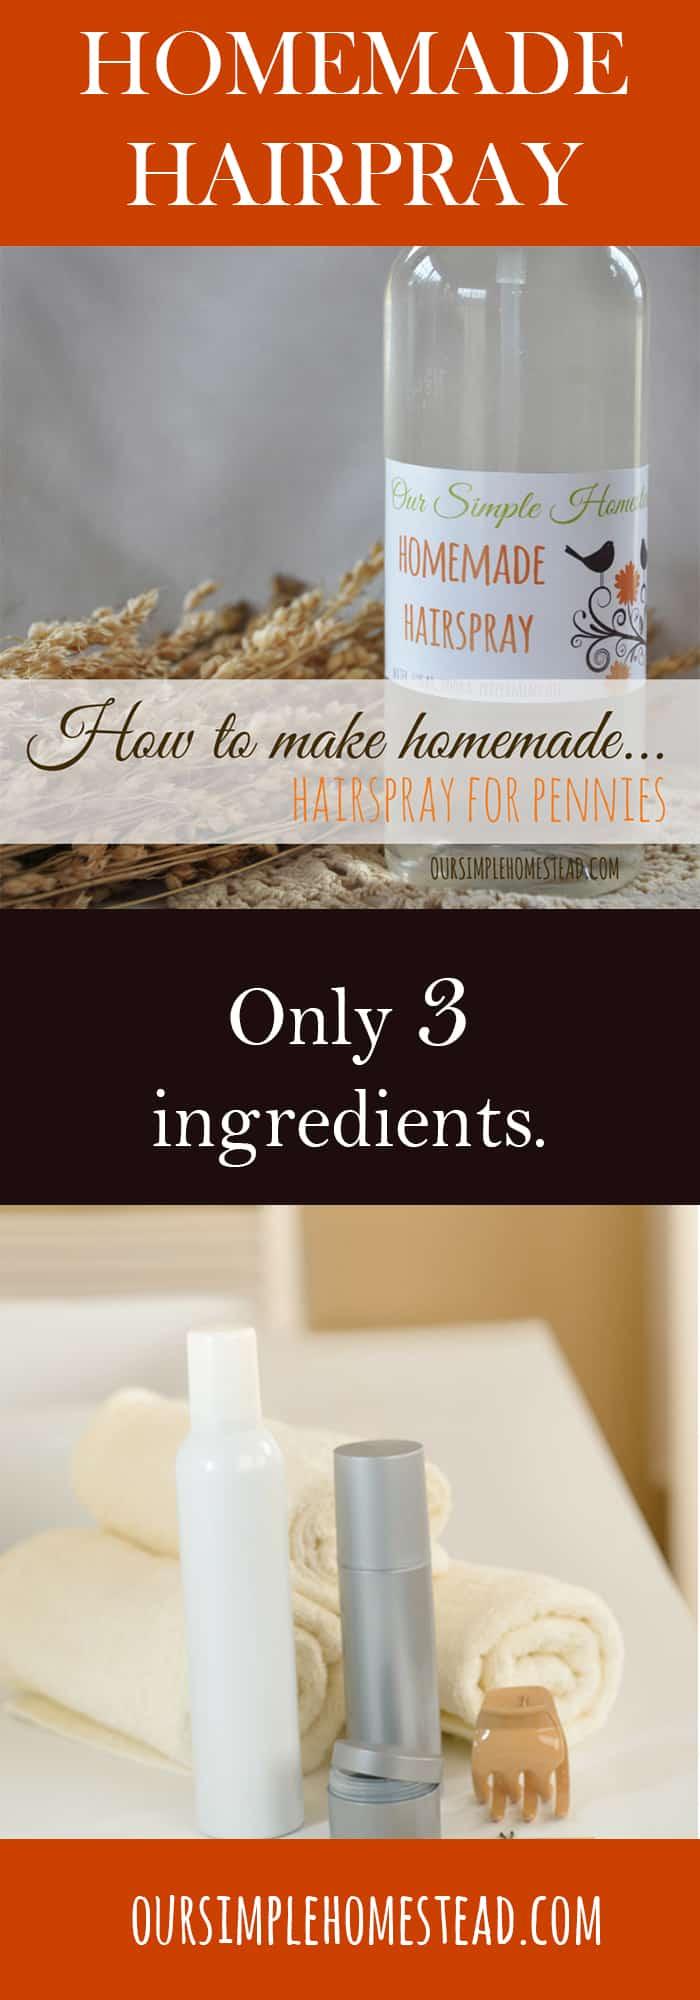 how to make hairspray homemade - diy recipe